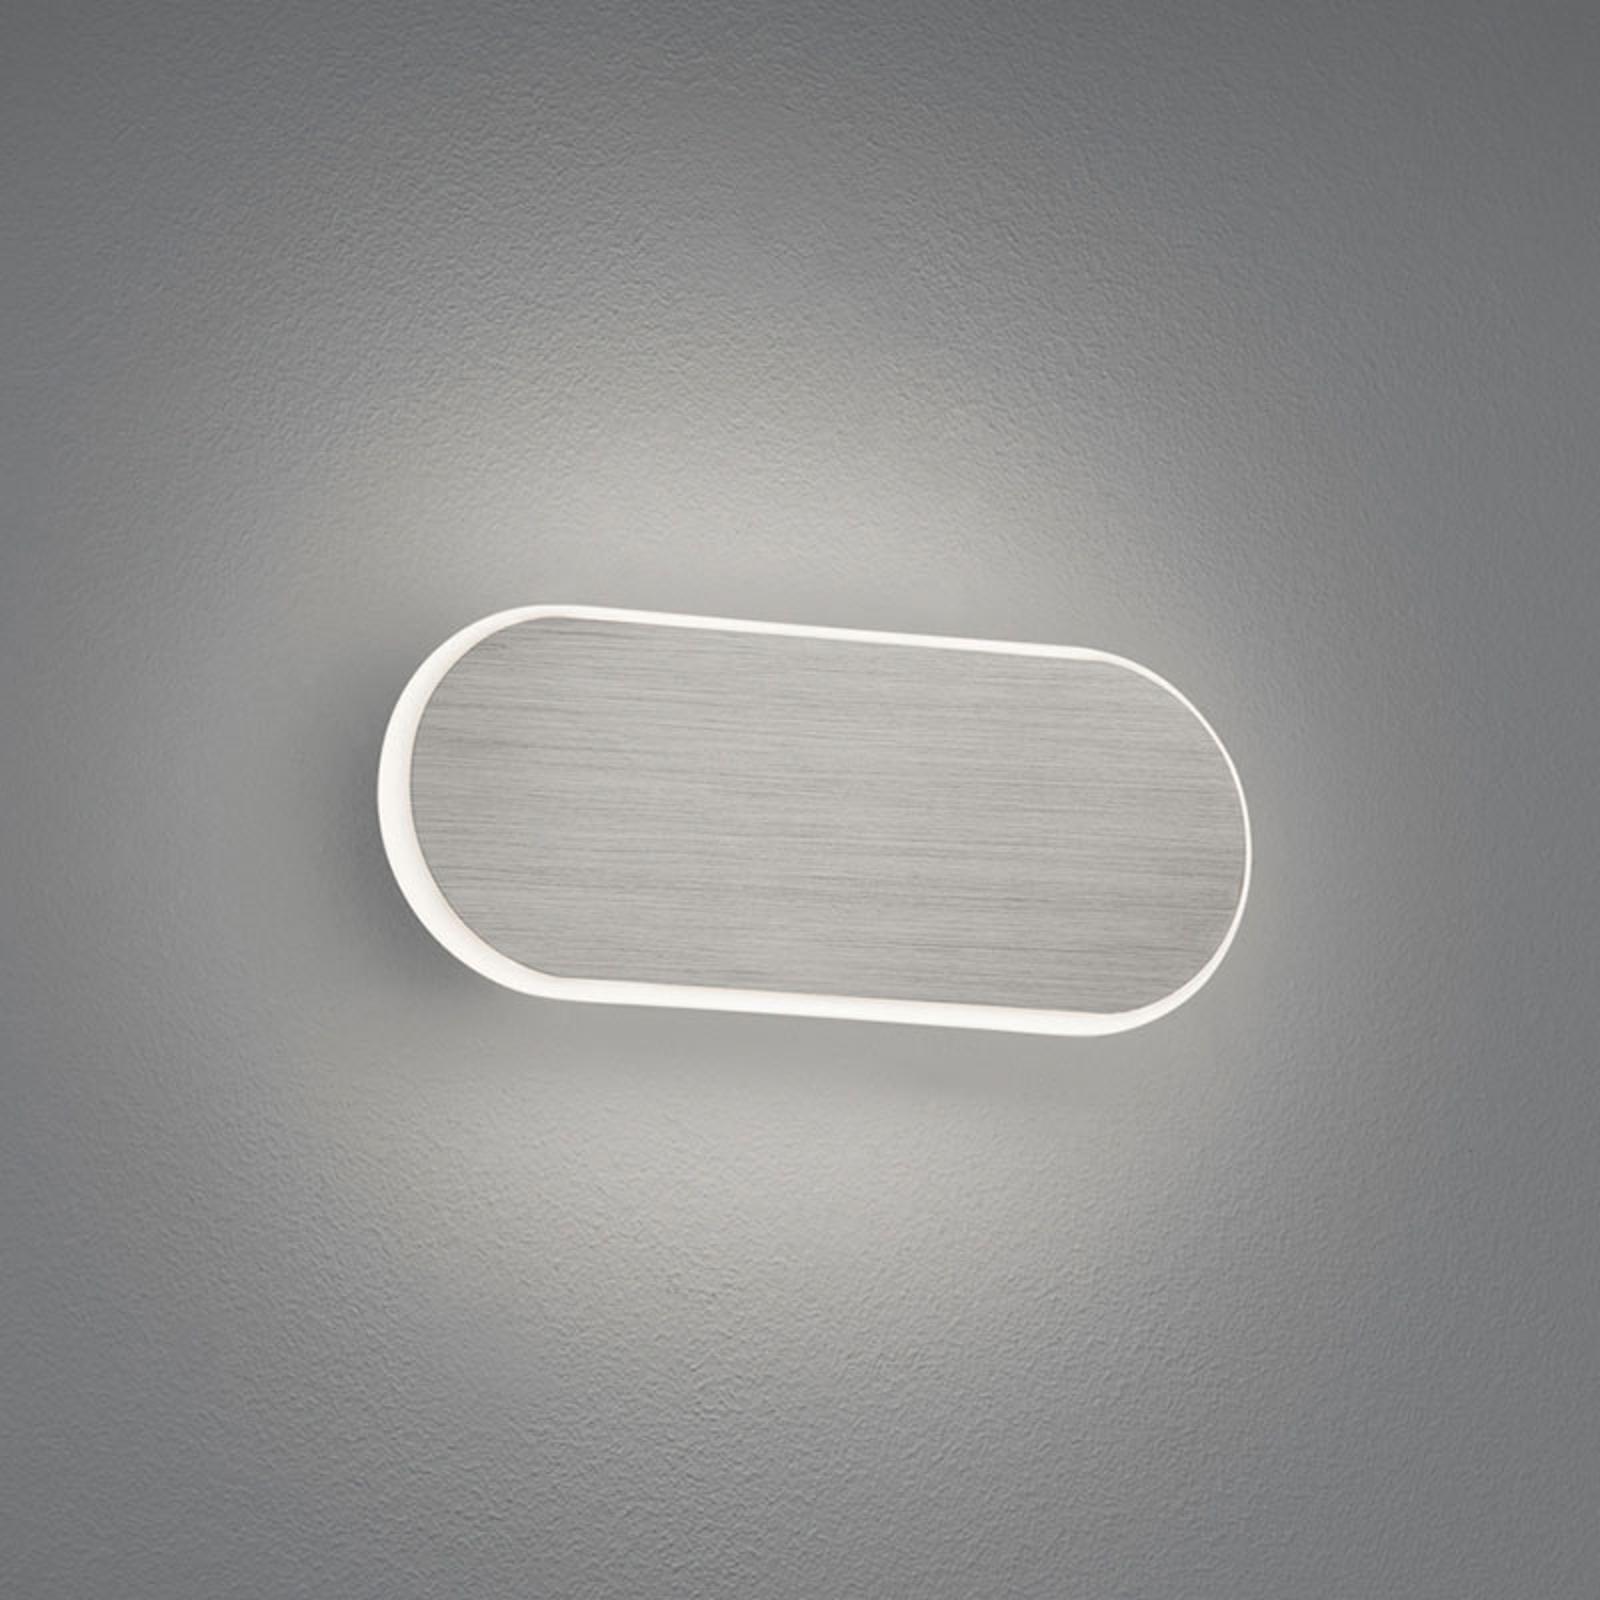 LED-Wandlampe Carlo, SwitchDim, 20 cm, nickel matt